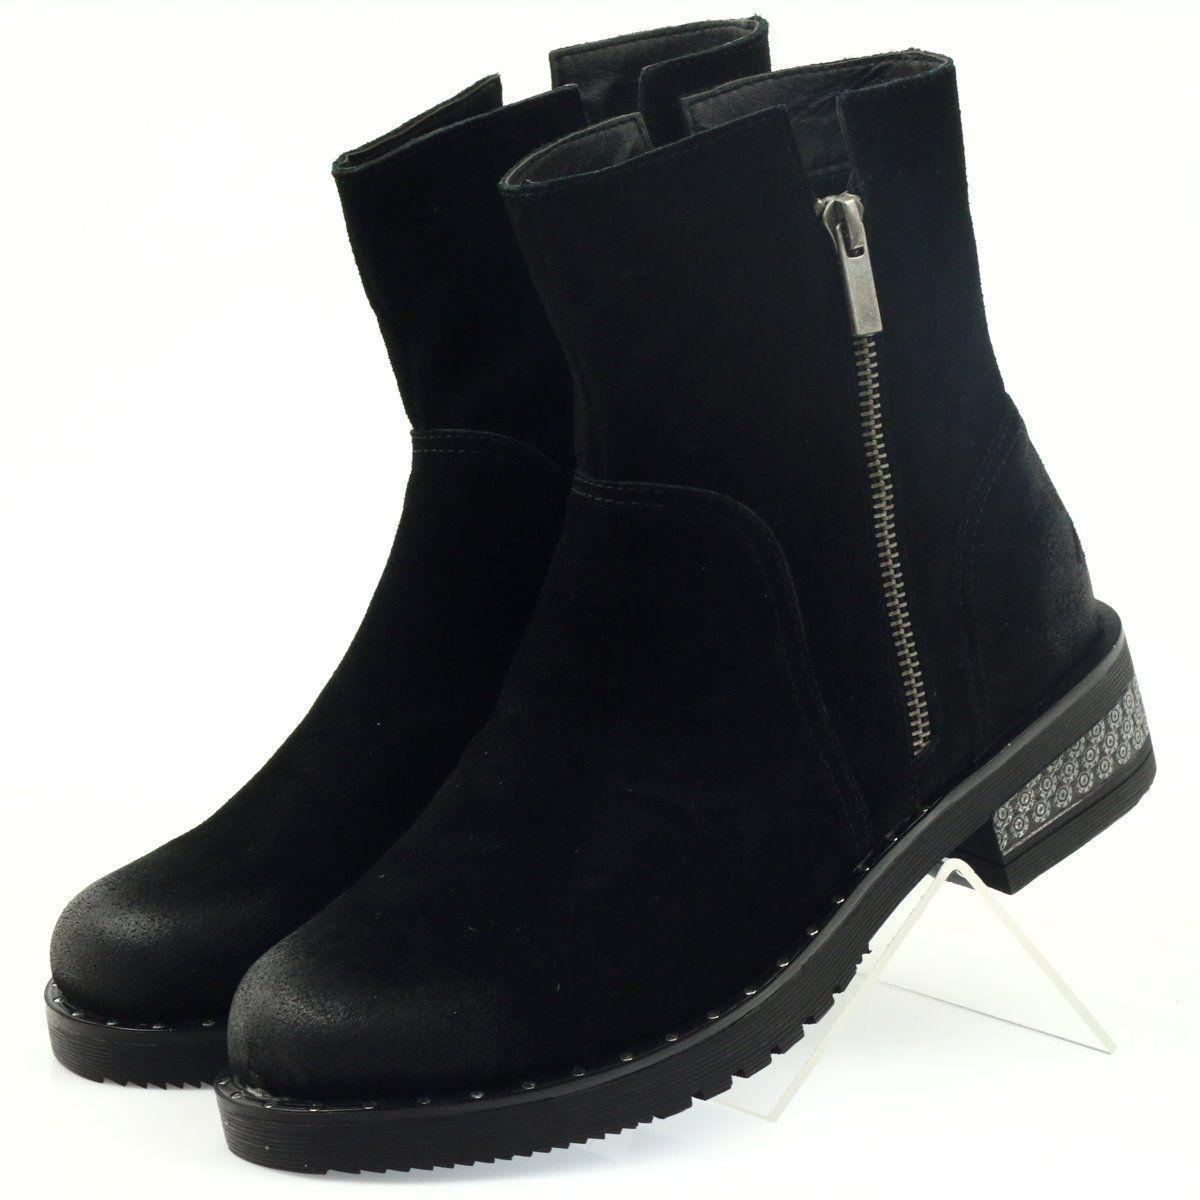 American Club American Botki Buty Zimowe Zamszowe Czarne Boots Winter Boots Black Boots